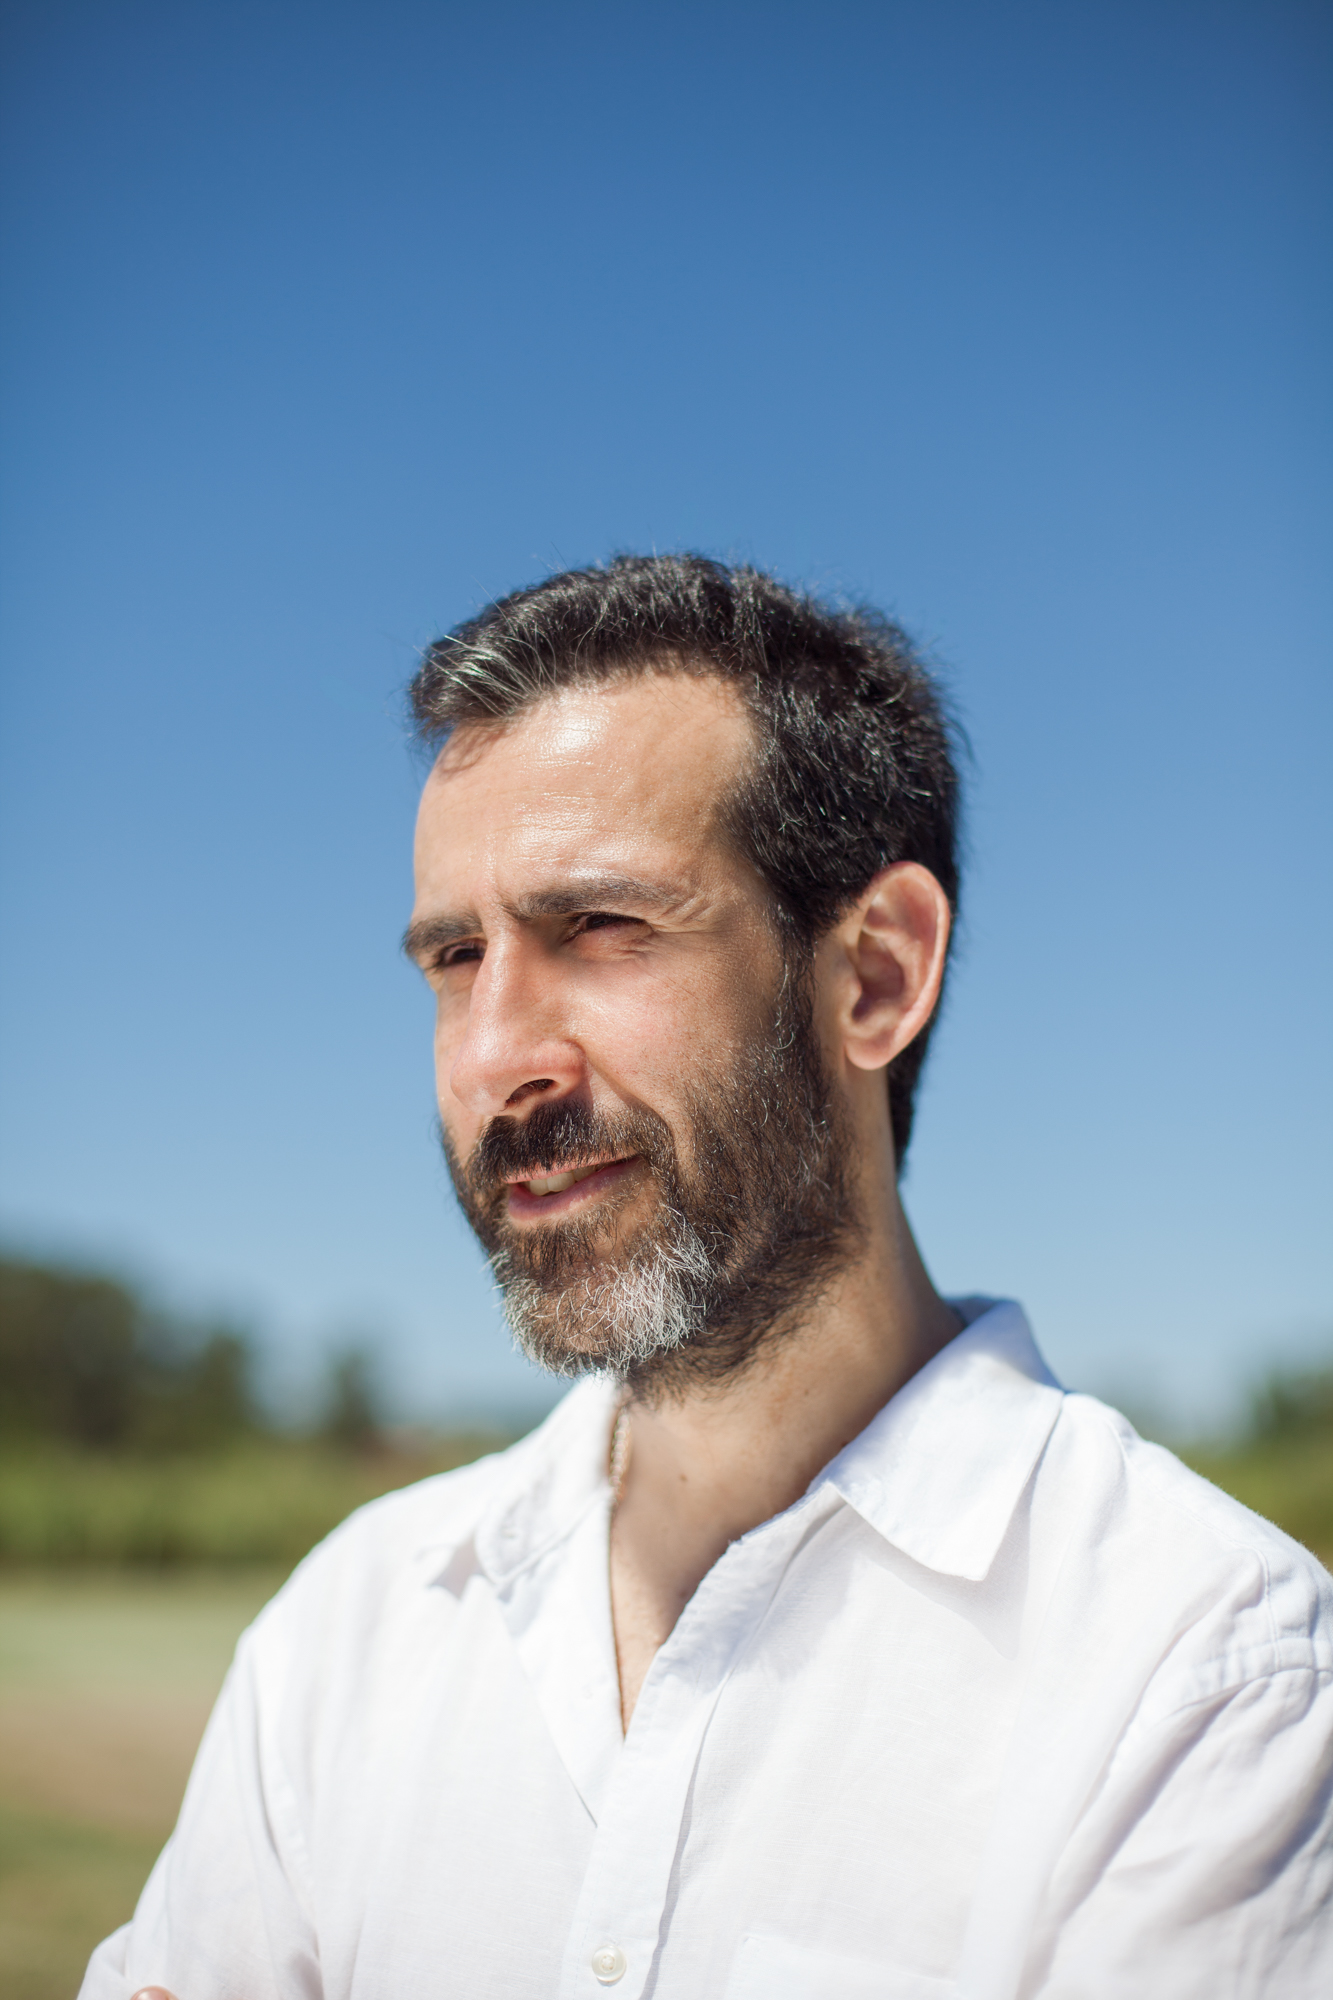 Santiago Garat